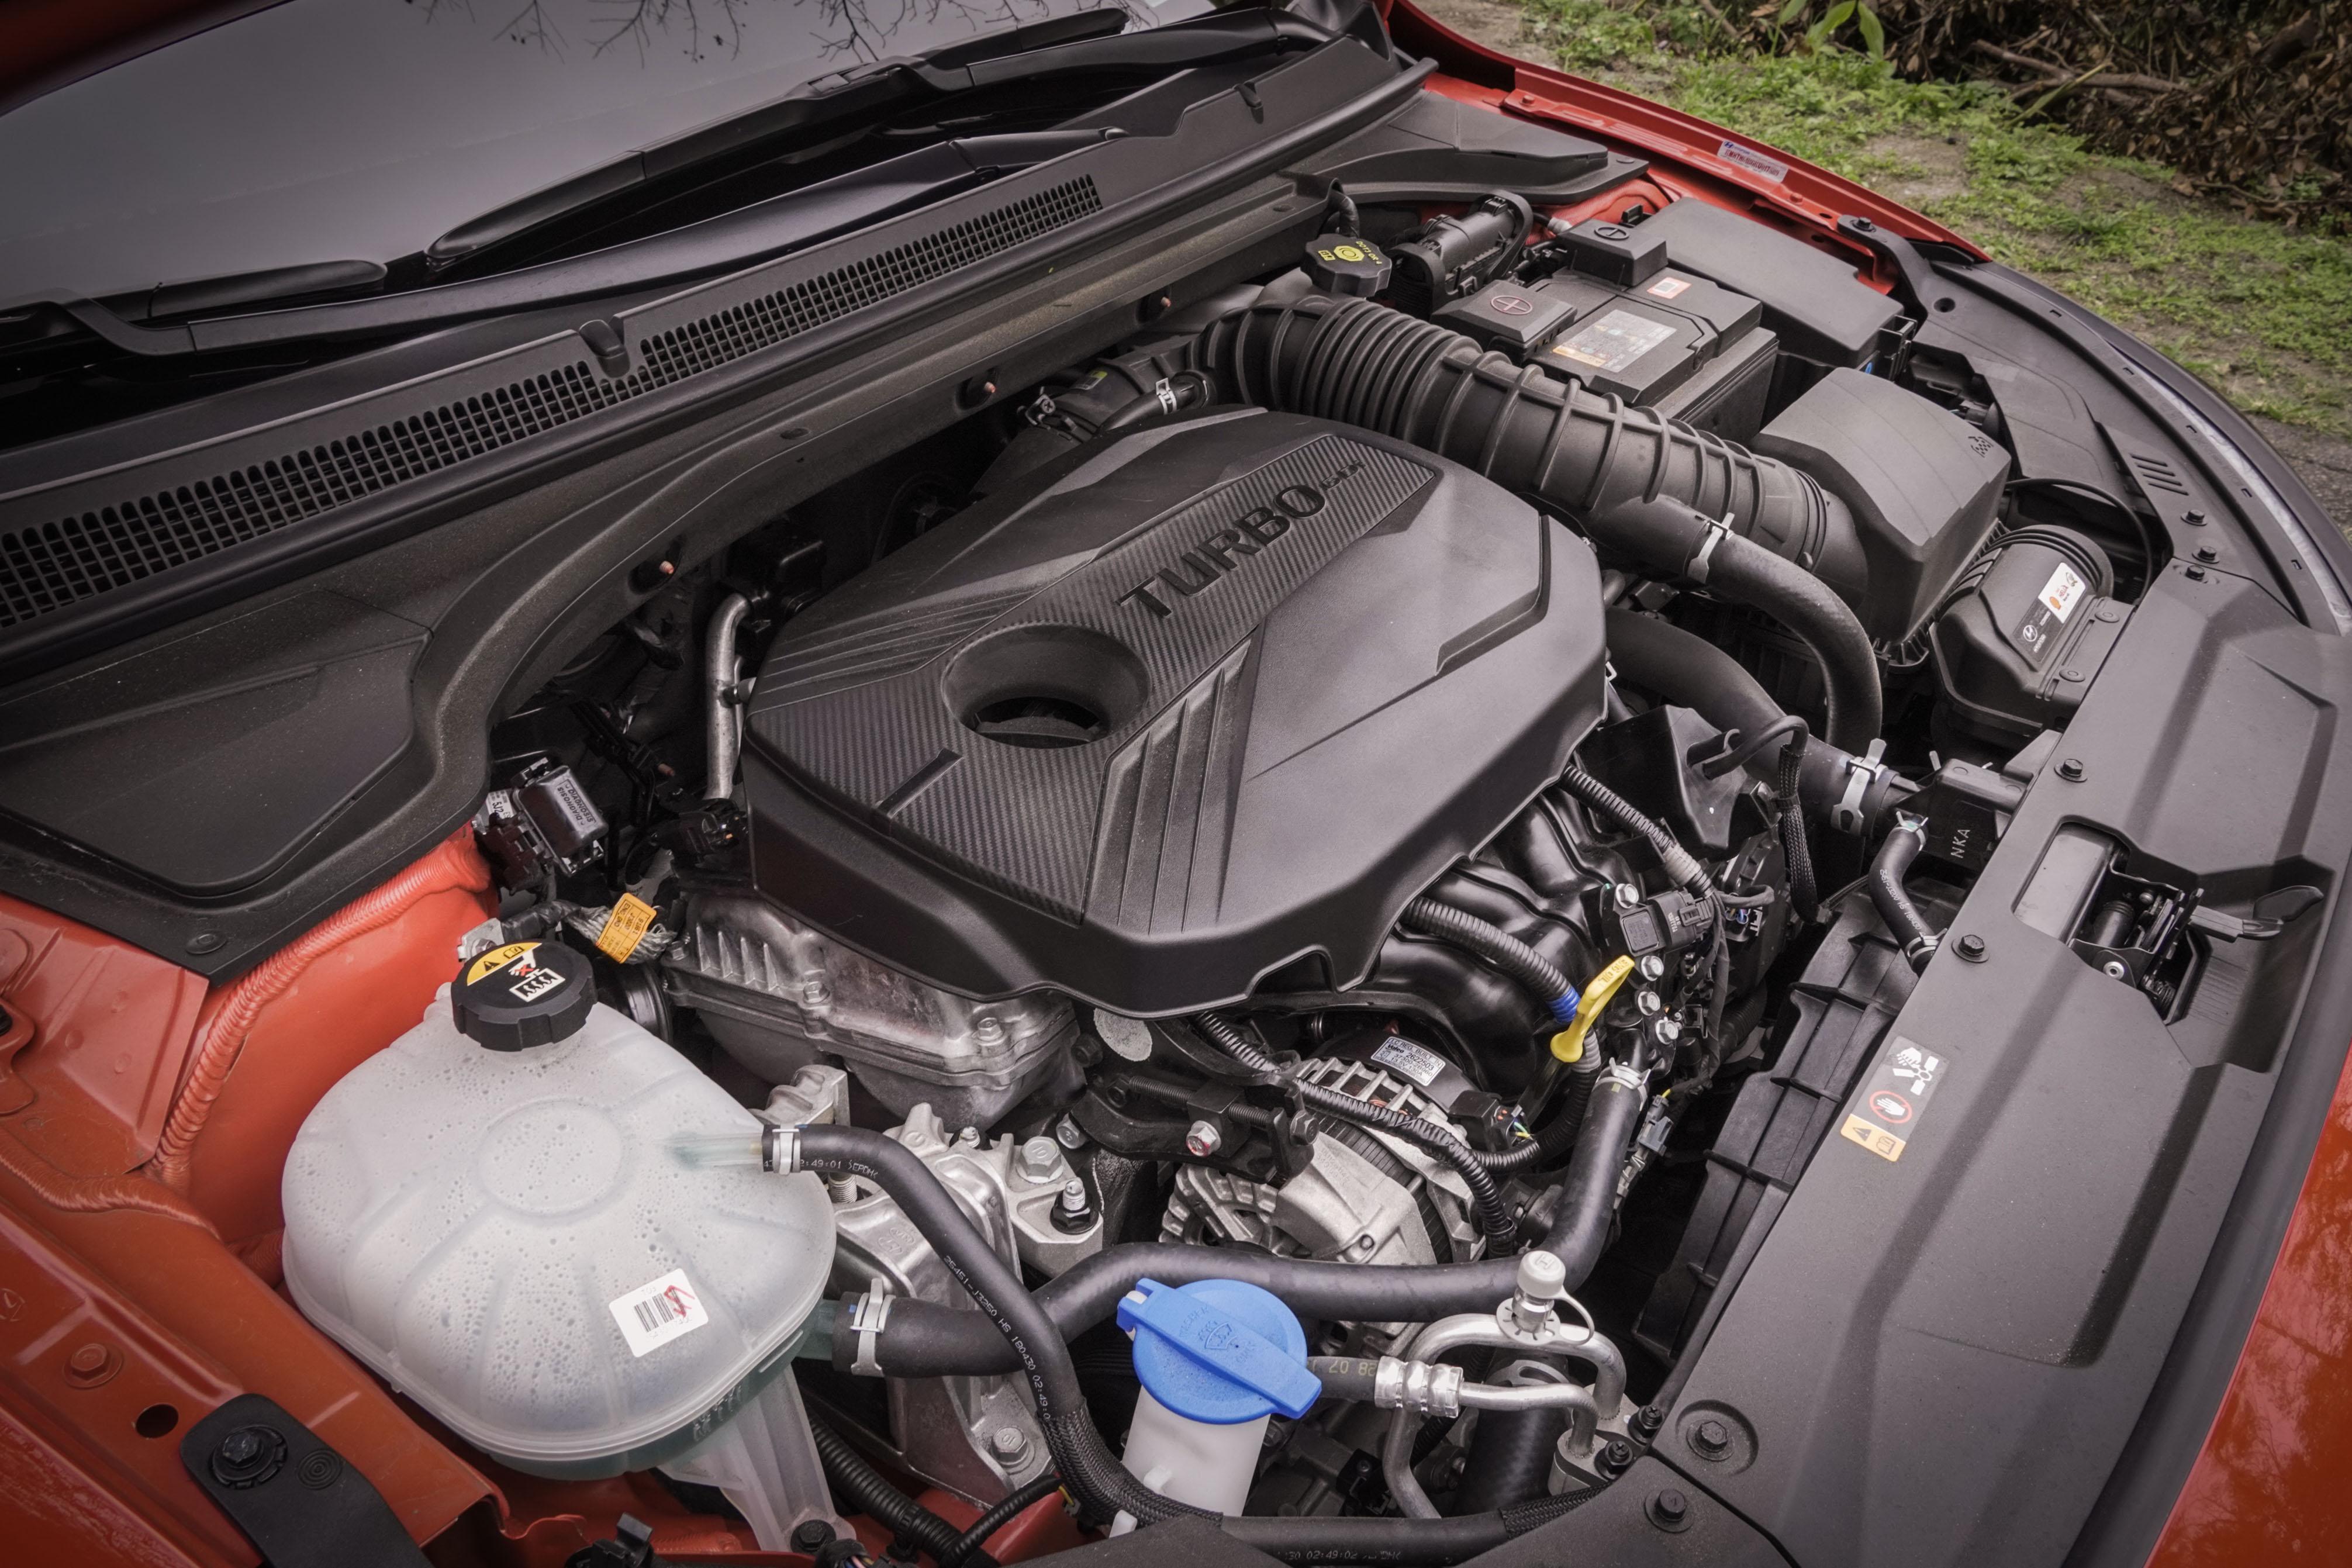 Veloster 動力源自於 1.6 升直四渦輪,採用 GDi 缸內直噴技術及電子洩壓閥。